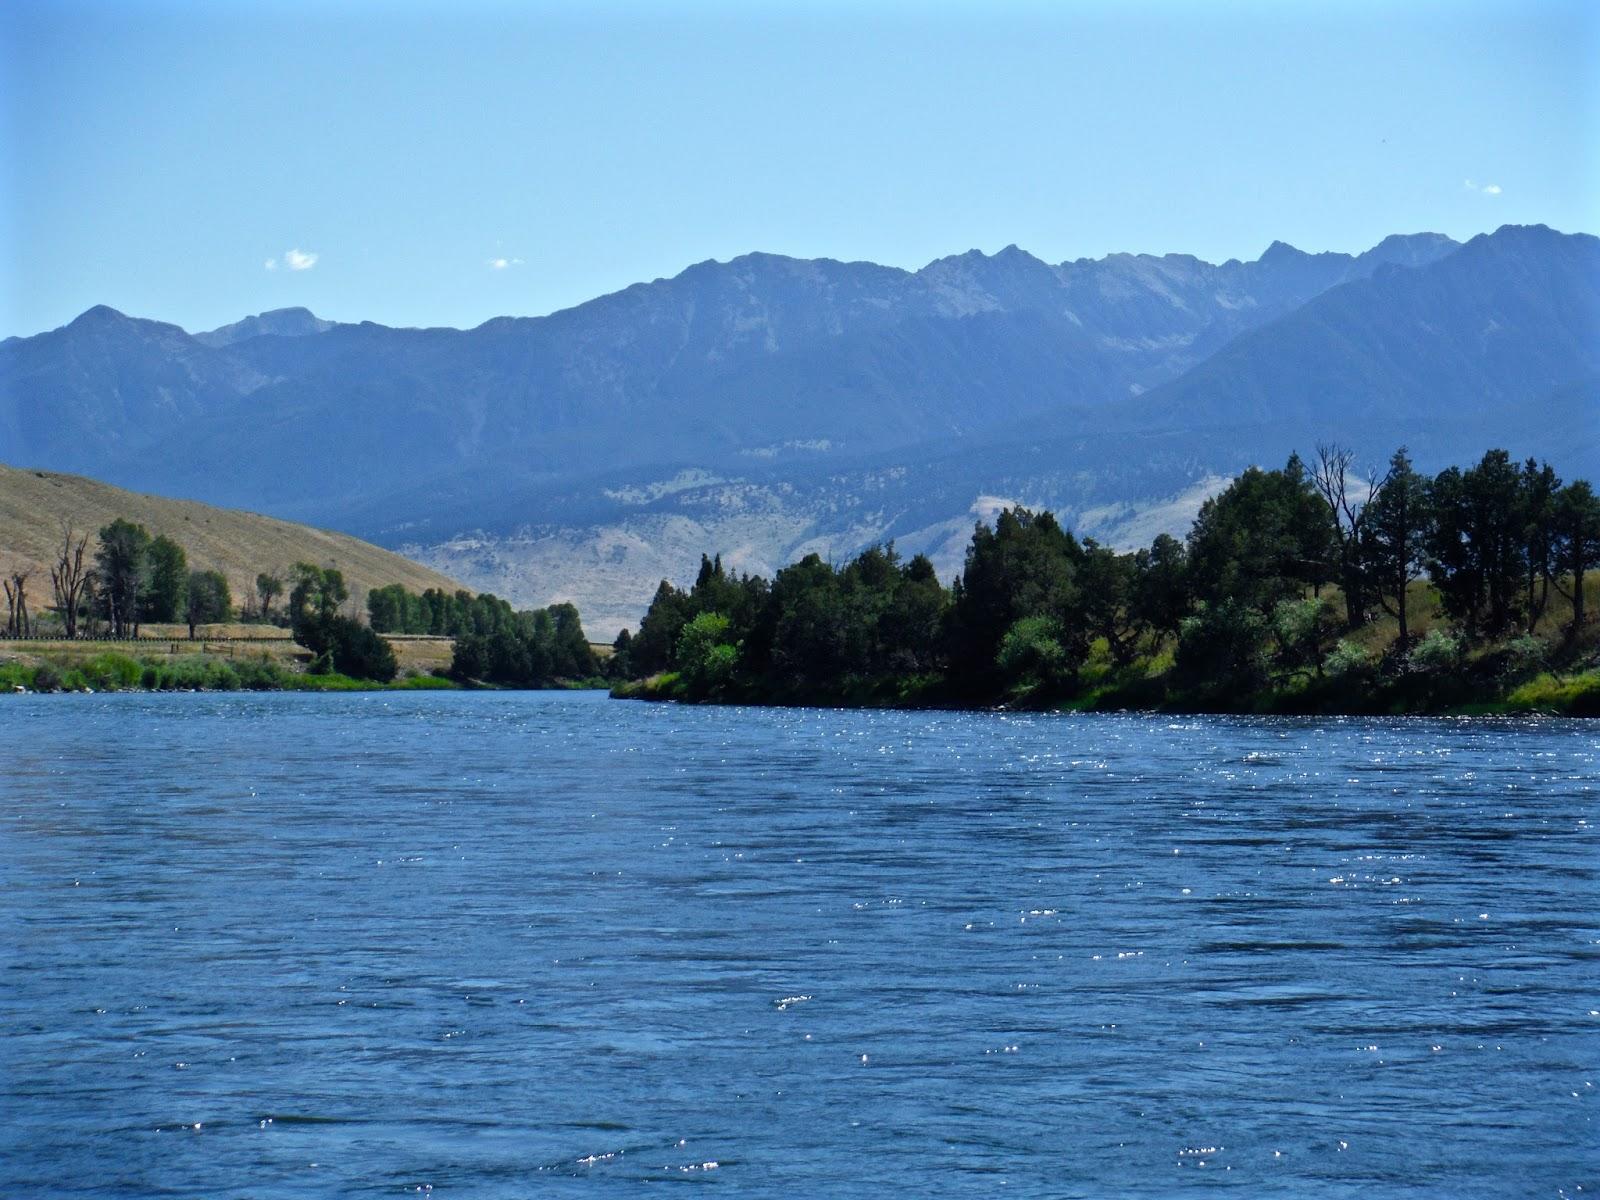 Erik s fly fishing blog back on the yellowstone river for Fly fishing yellowstone river